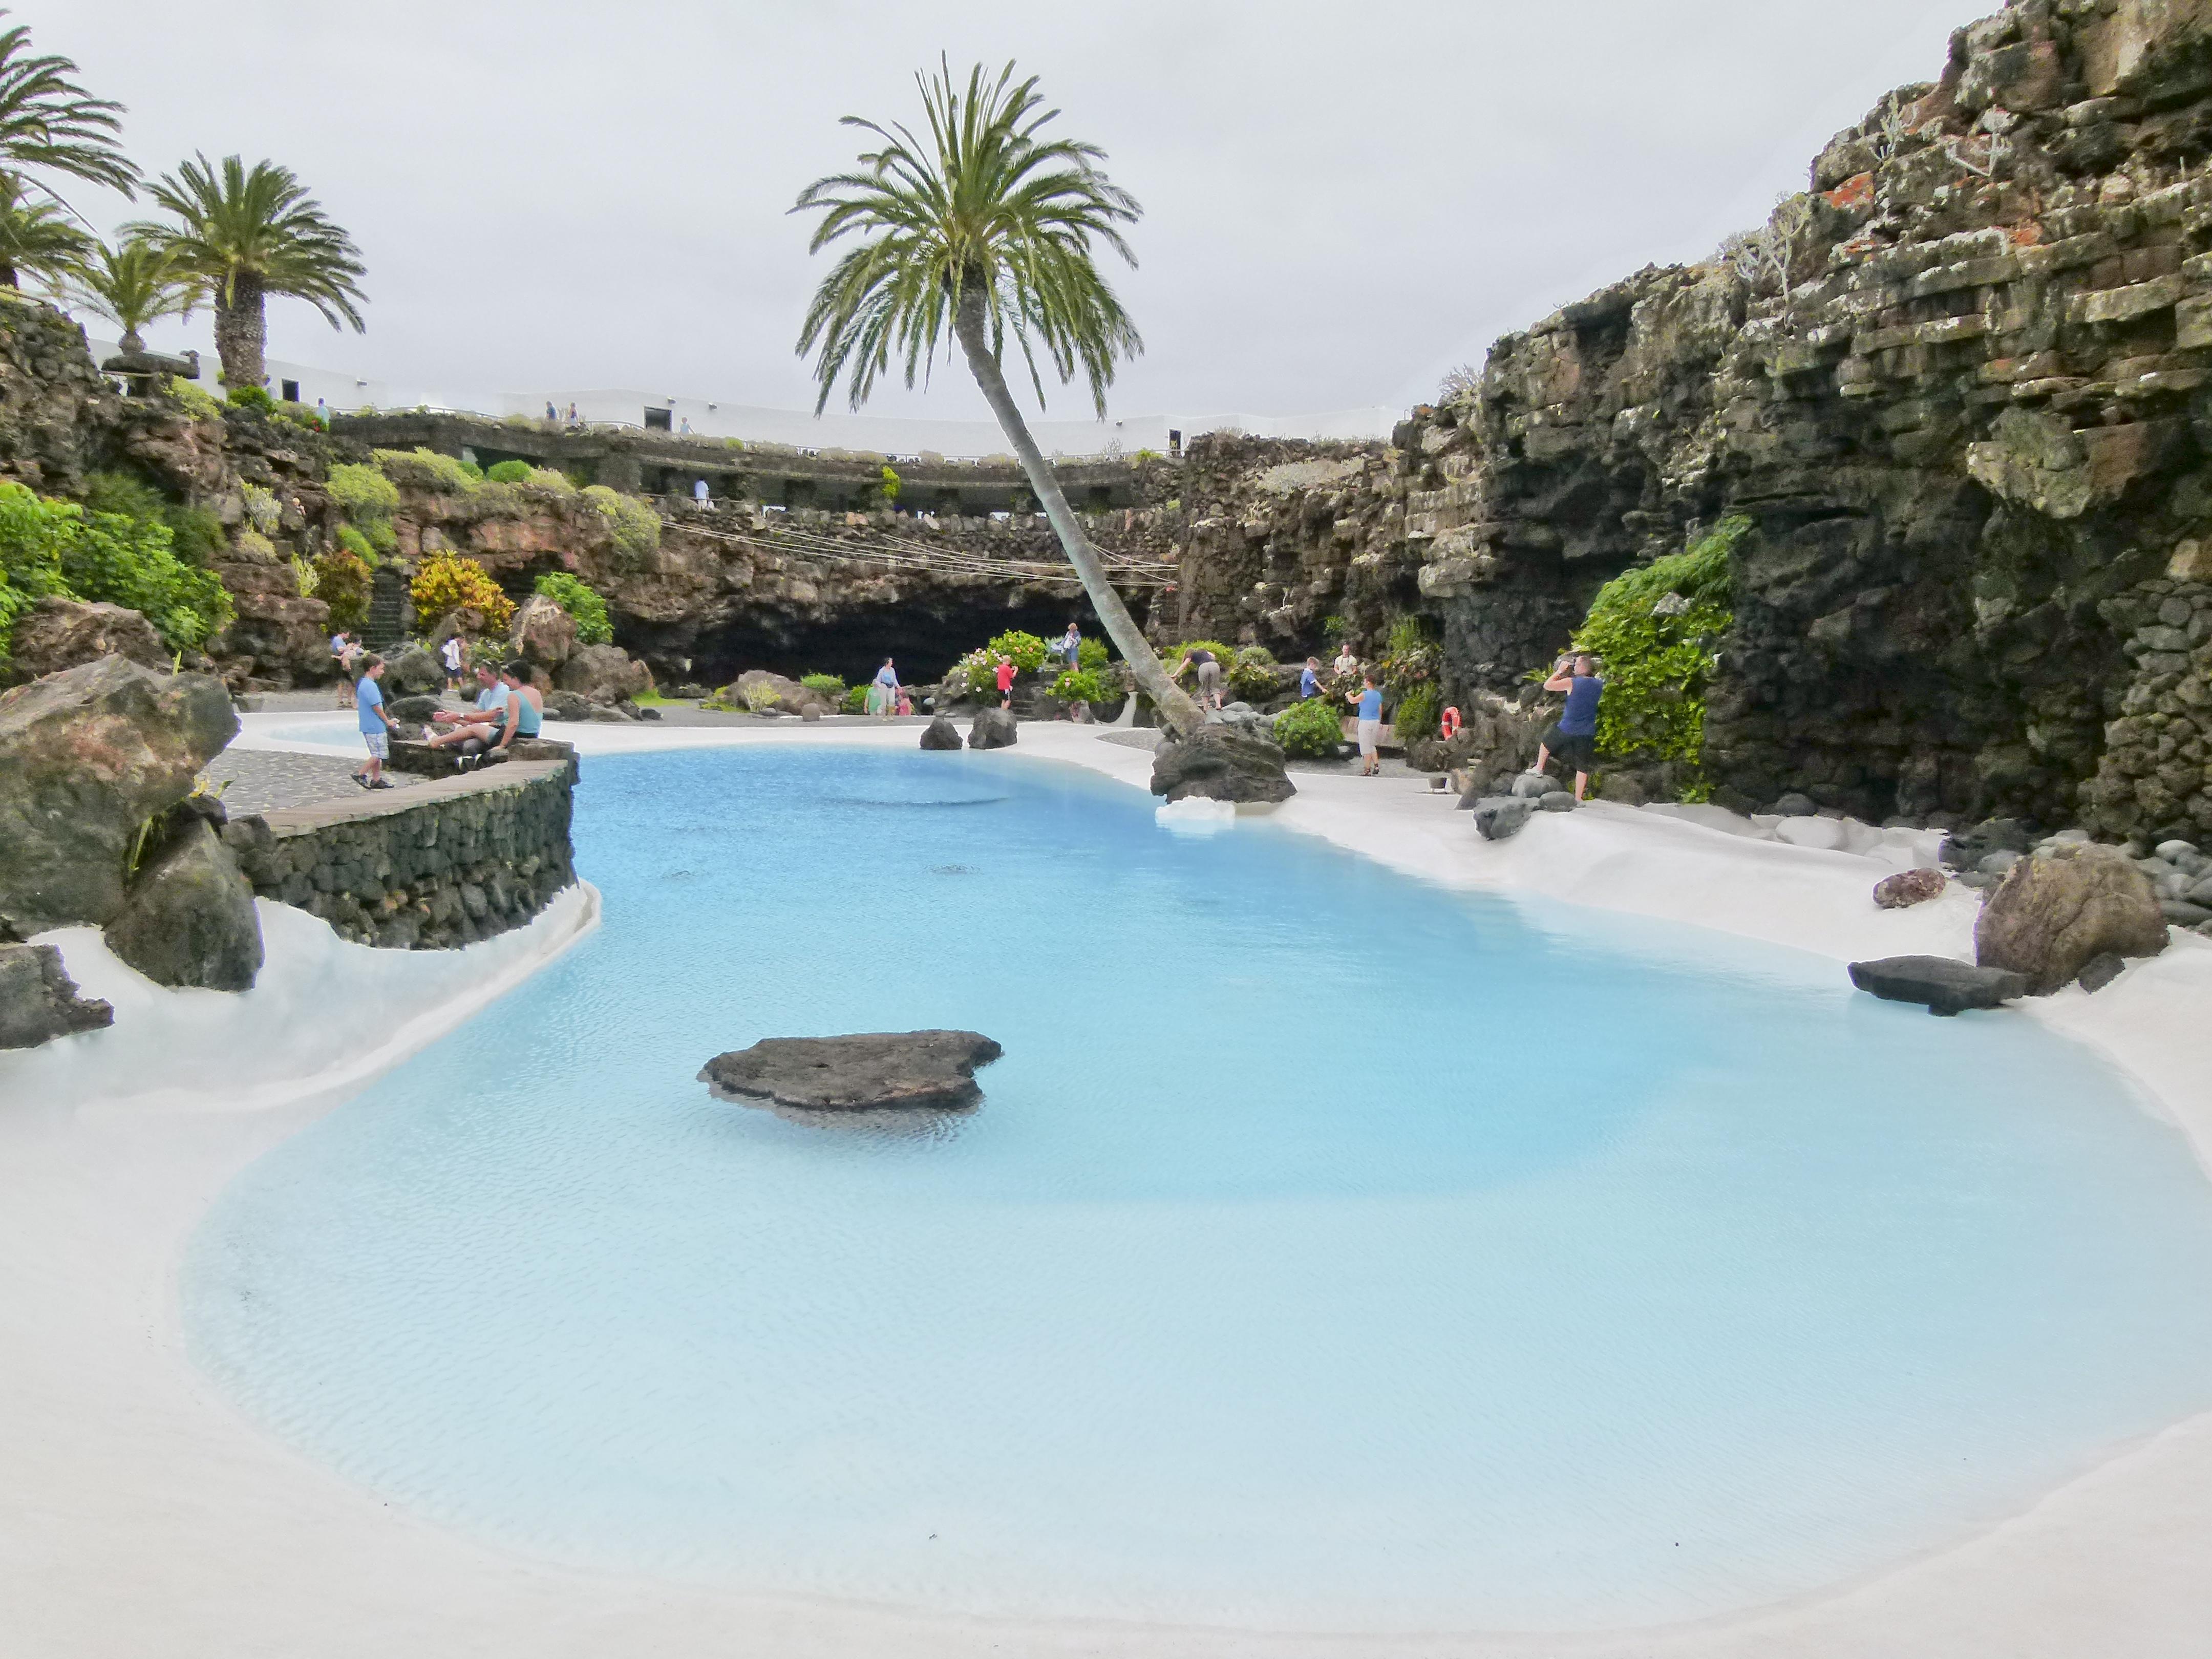 Lanzarote Canary Islands Best Beaches